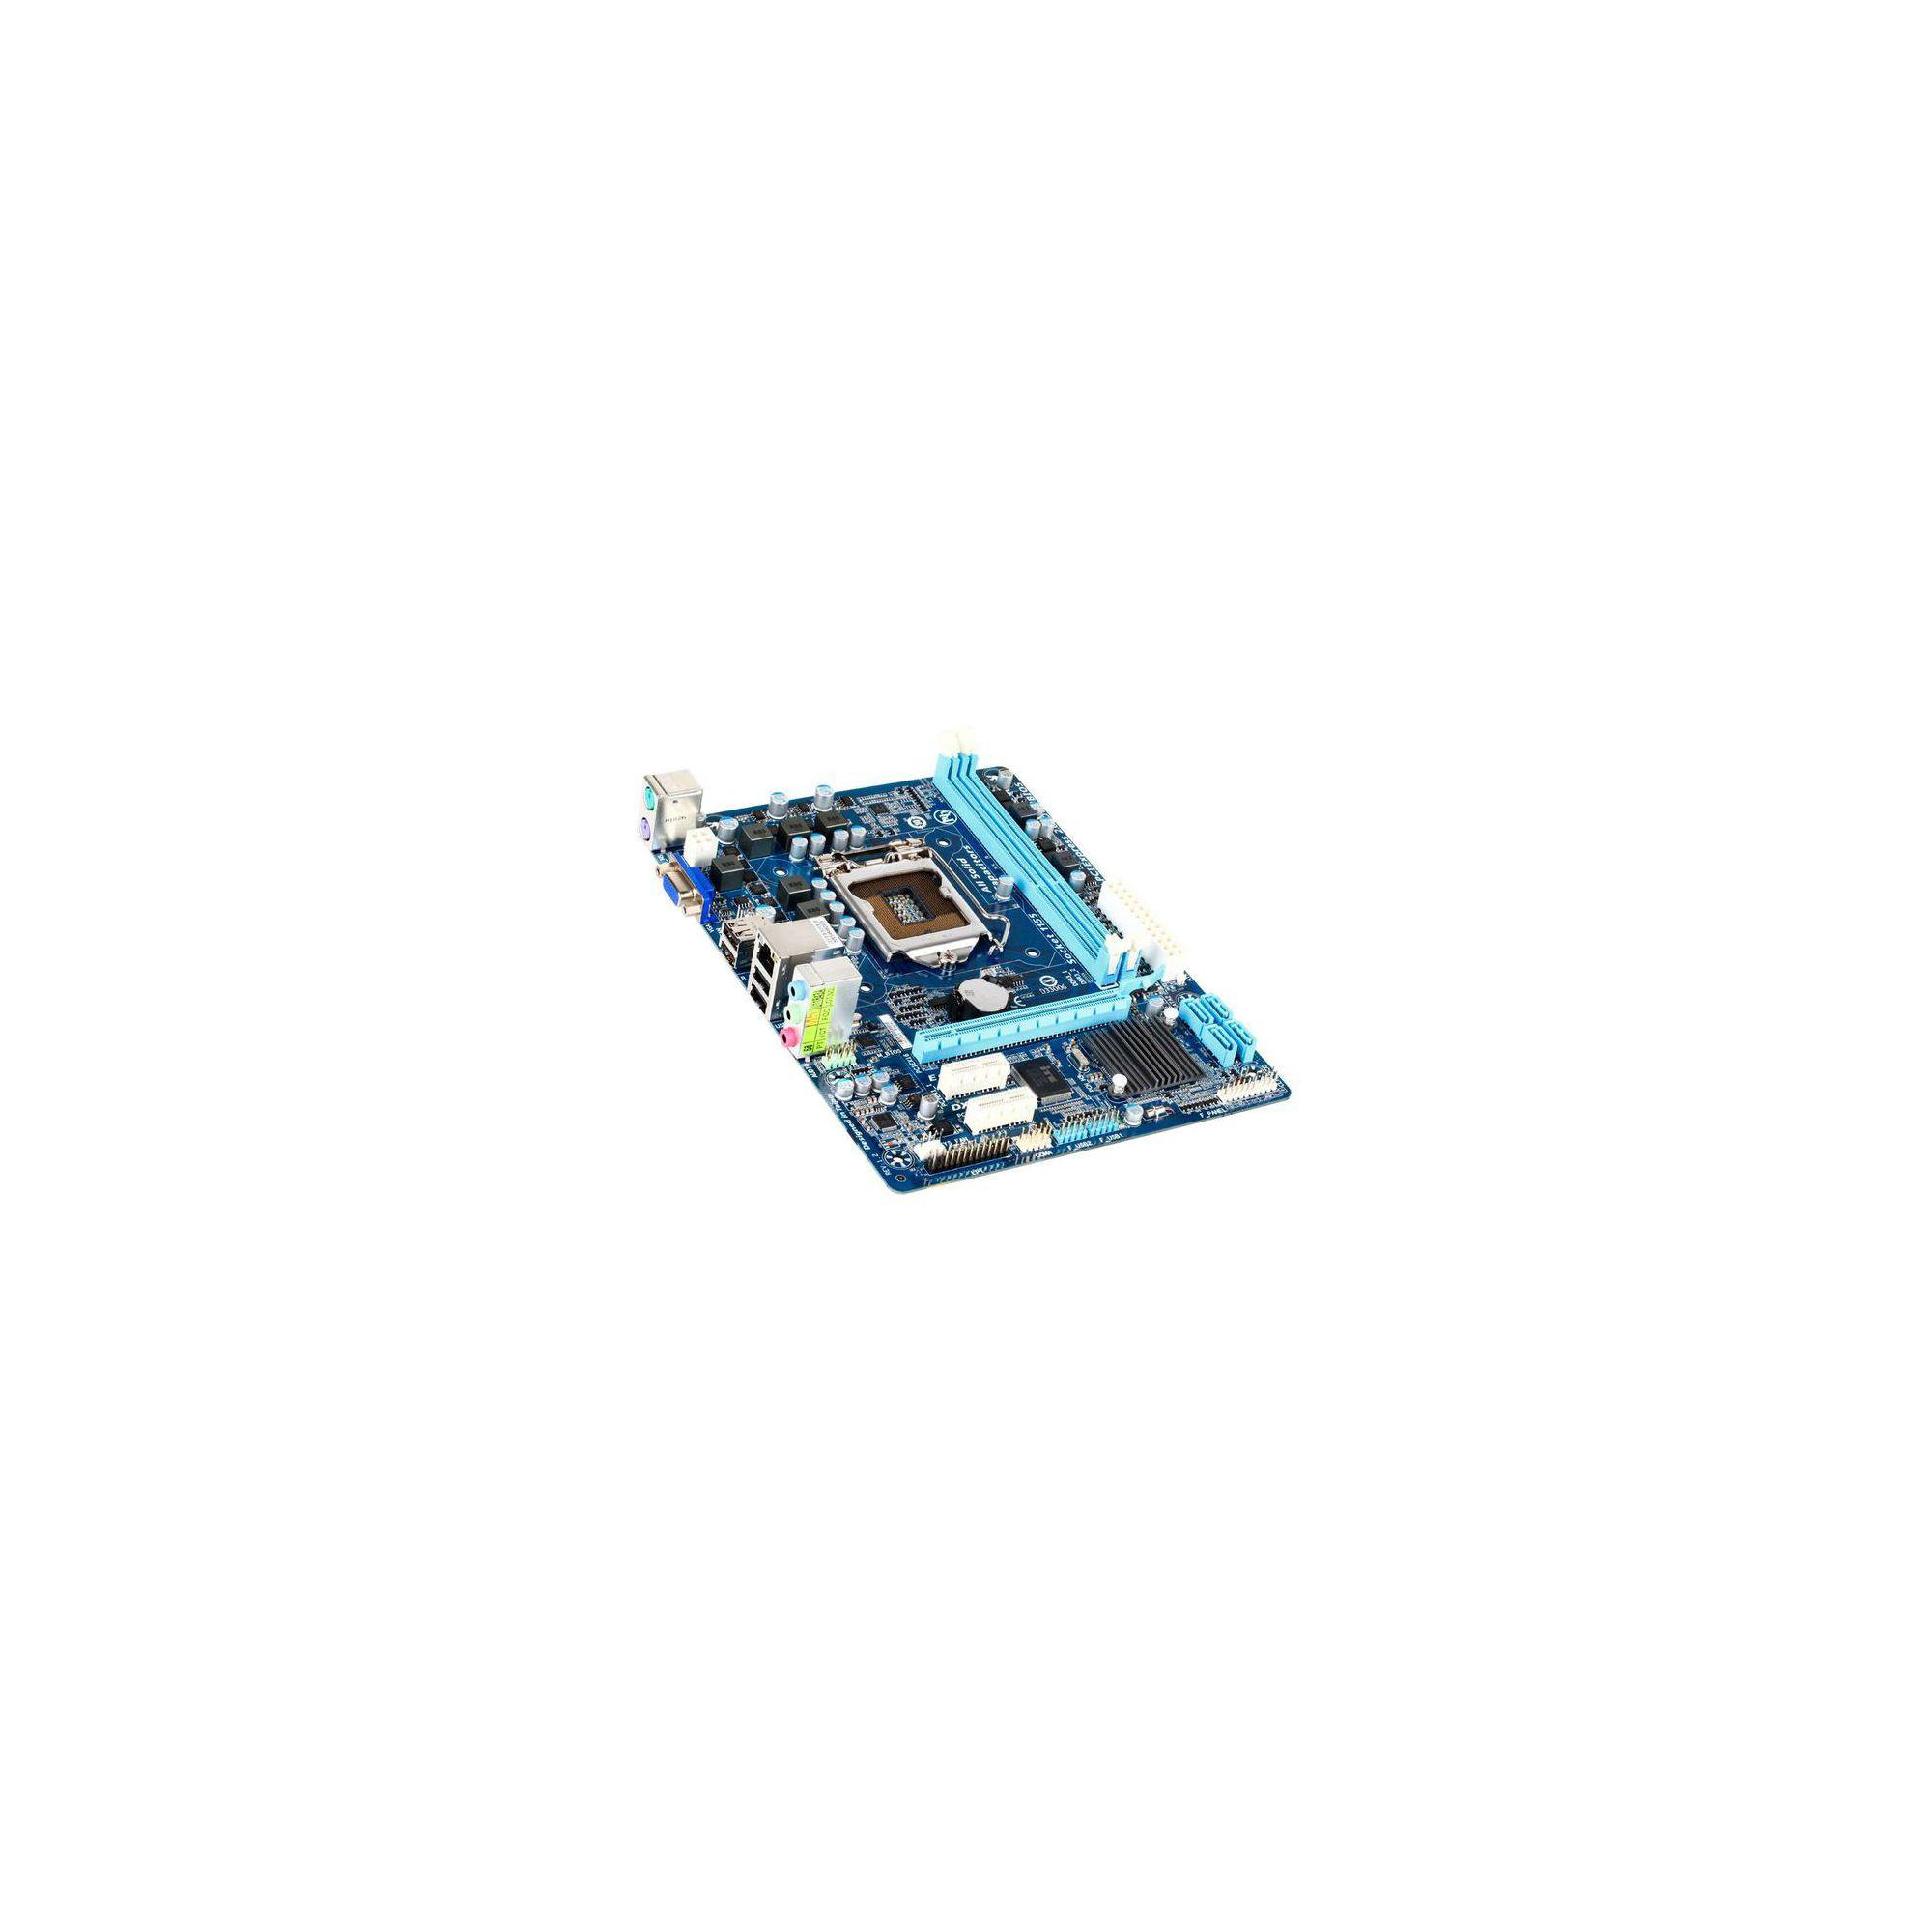 gigabyte-ga-h61m-ds2-motherboard-core-socket-1155-intel-h61-micro-atx-sata-gigabit-lan